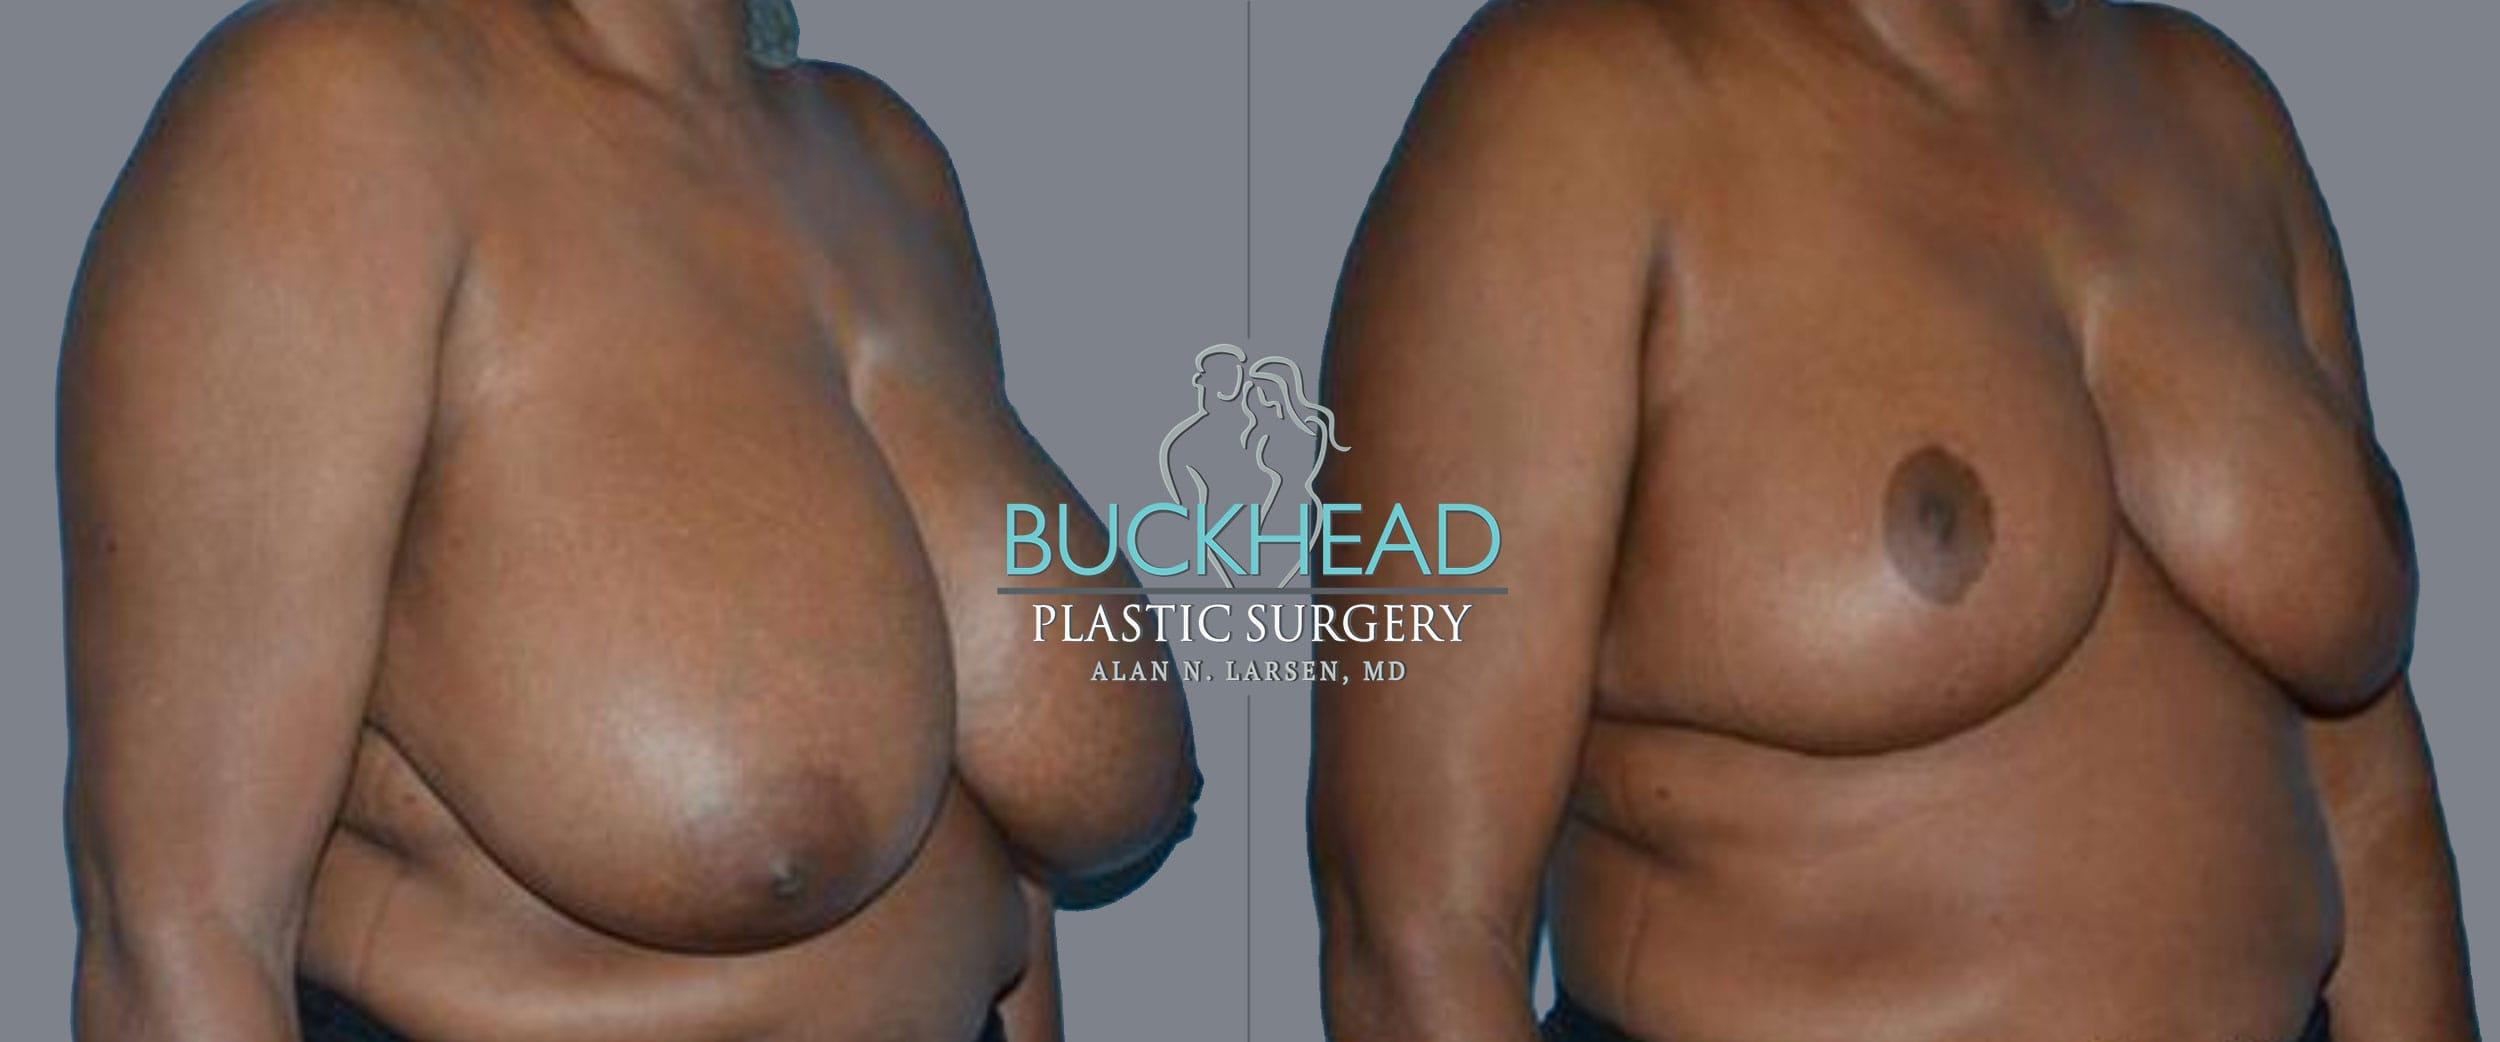 Before and After Photo Gallery | Breast Reduction | Buckhead Plastic Surgery | Alan N. Larsen, MD | Board-Certified Plastic Surgeon | Atlanta GA